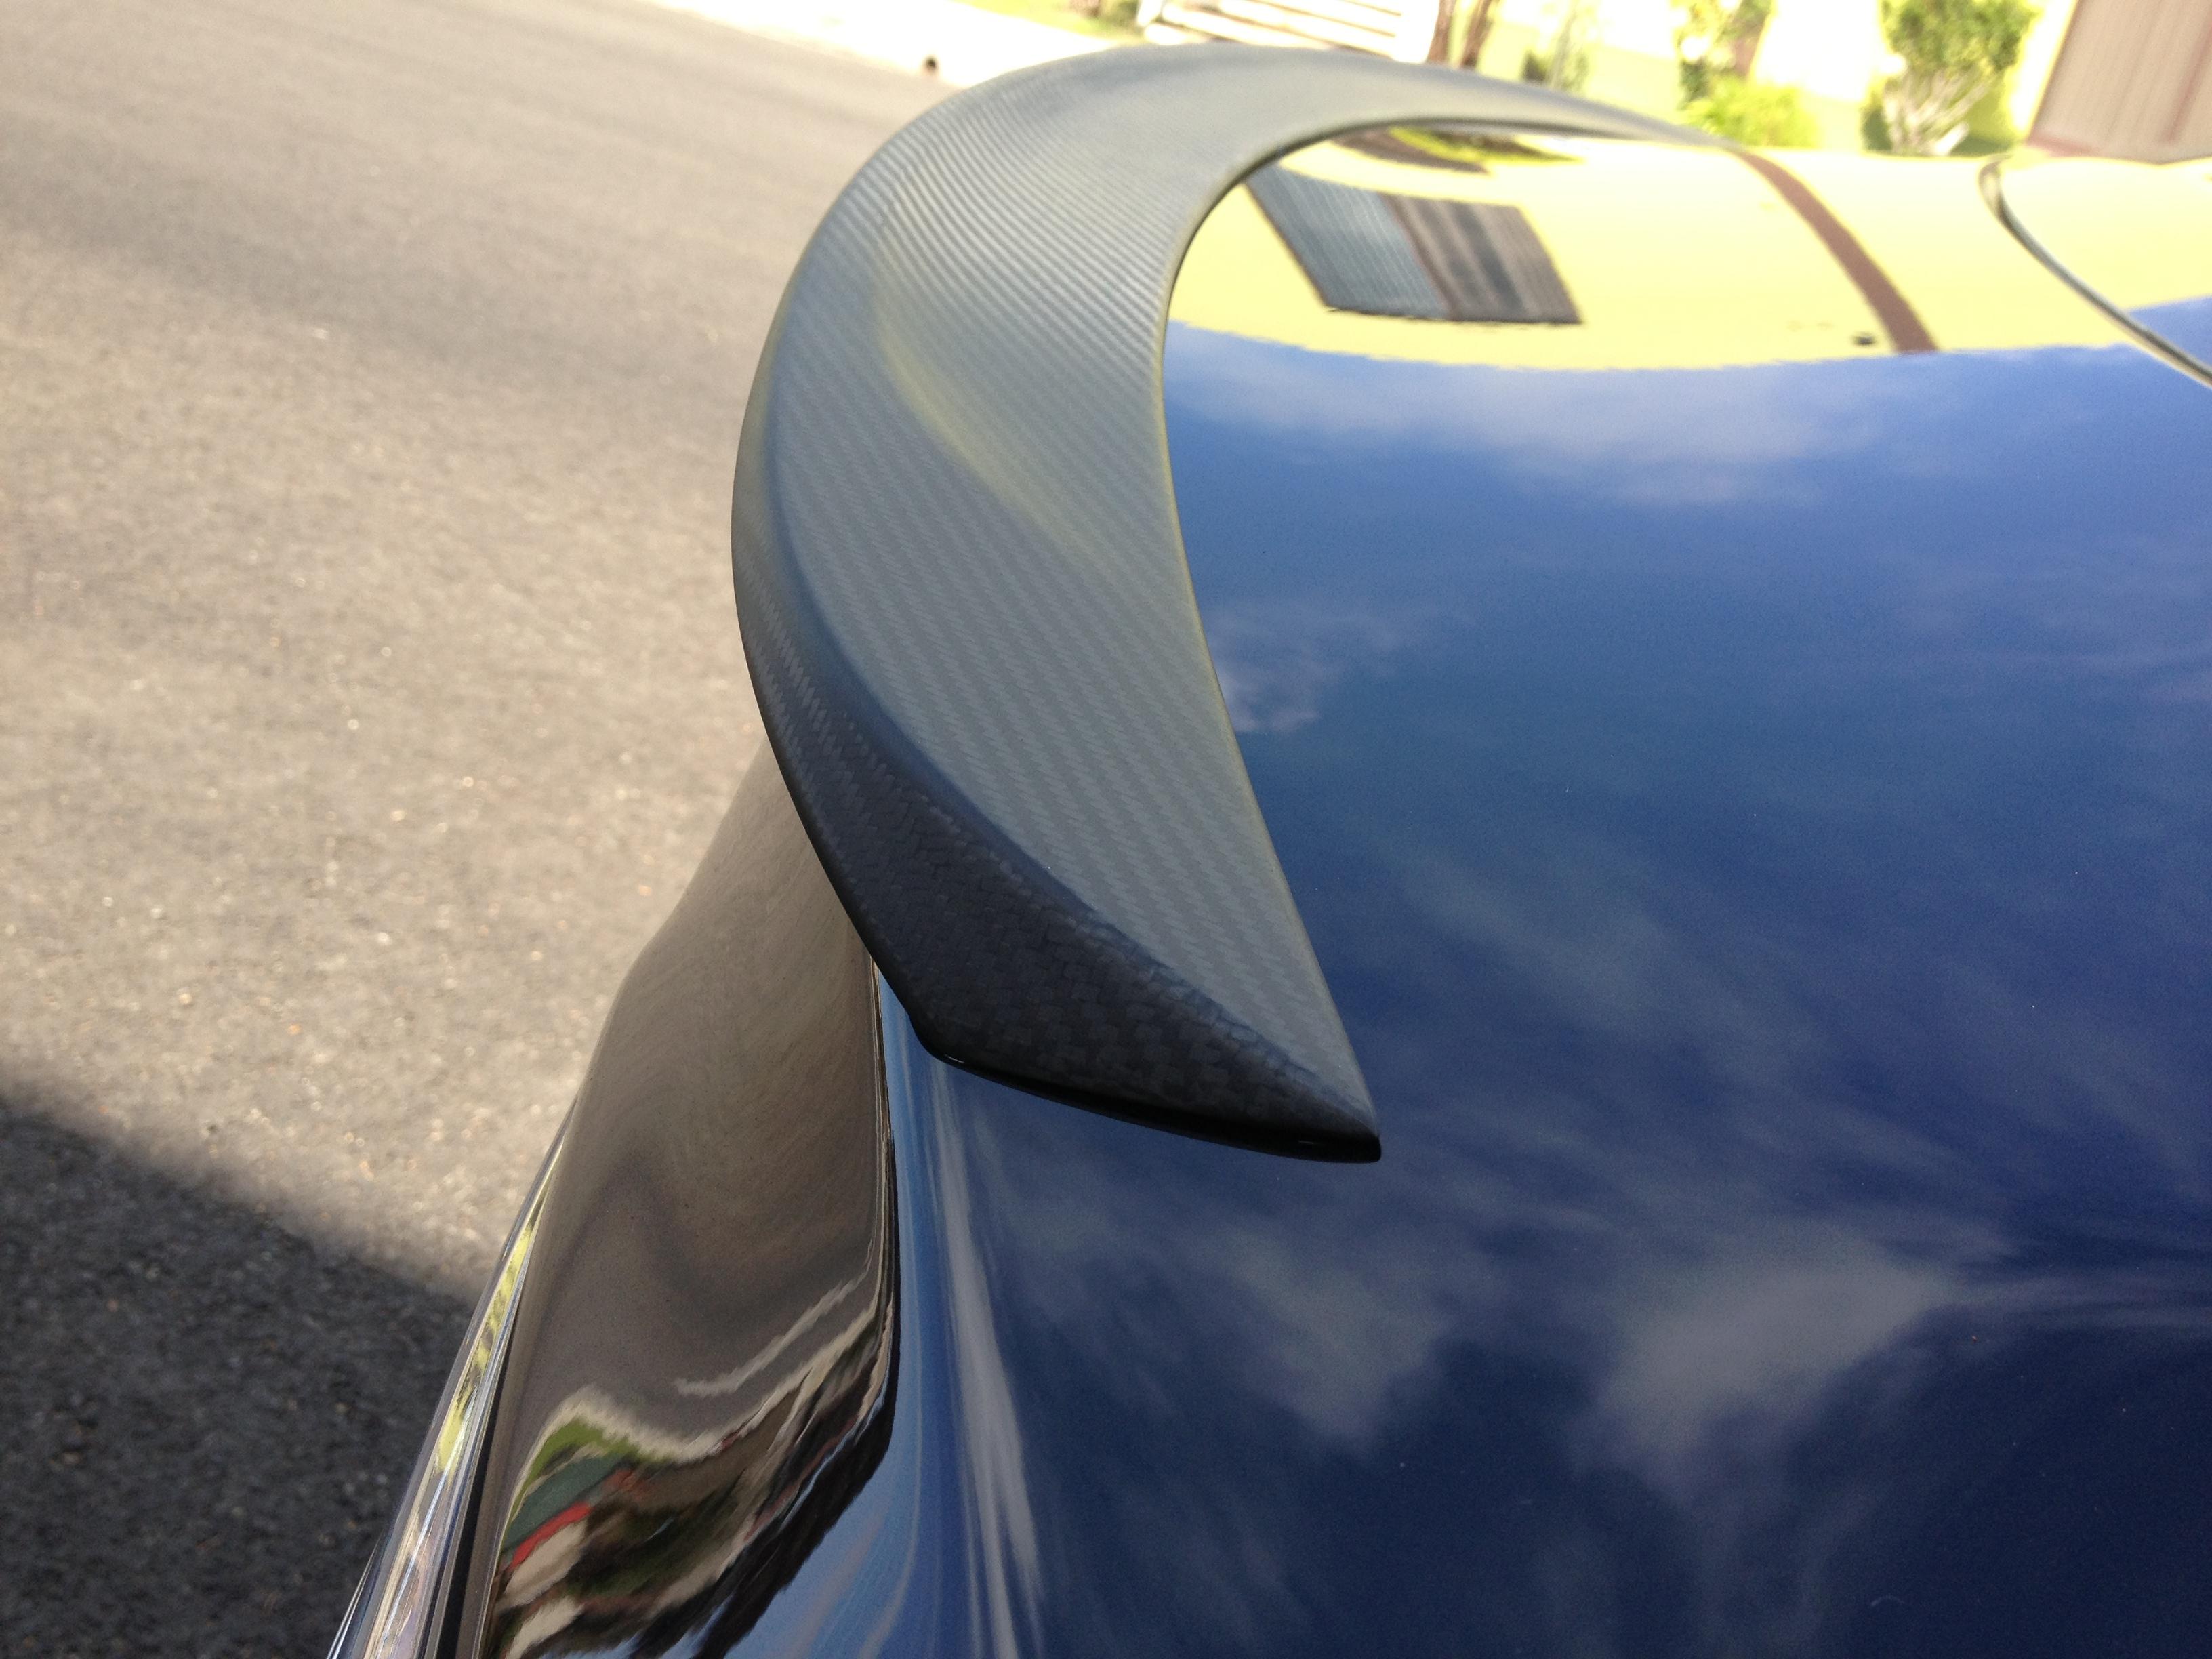 Tesla Model S Carbon Fiber Spoiler Matte